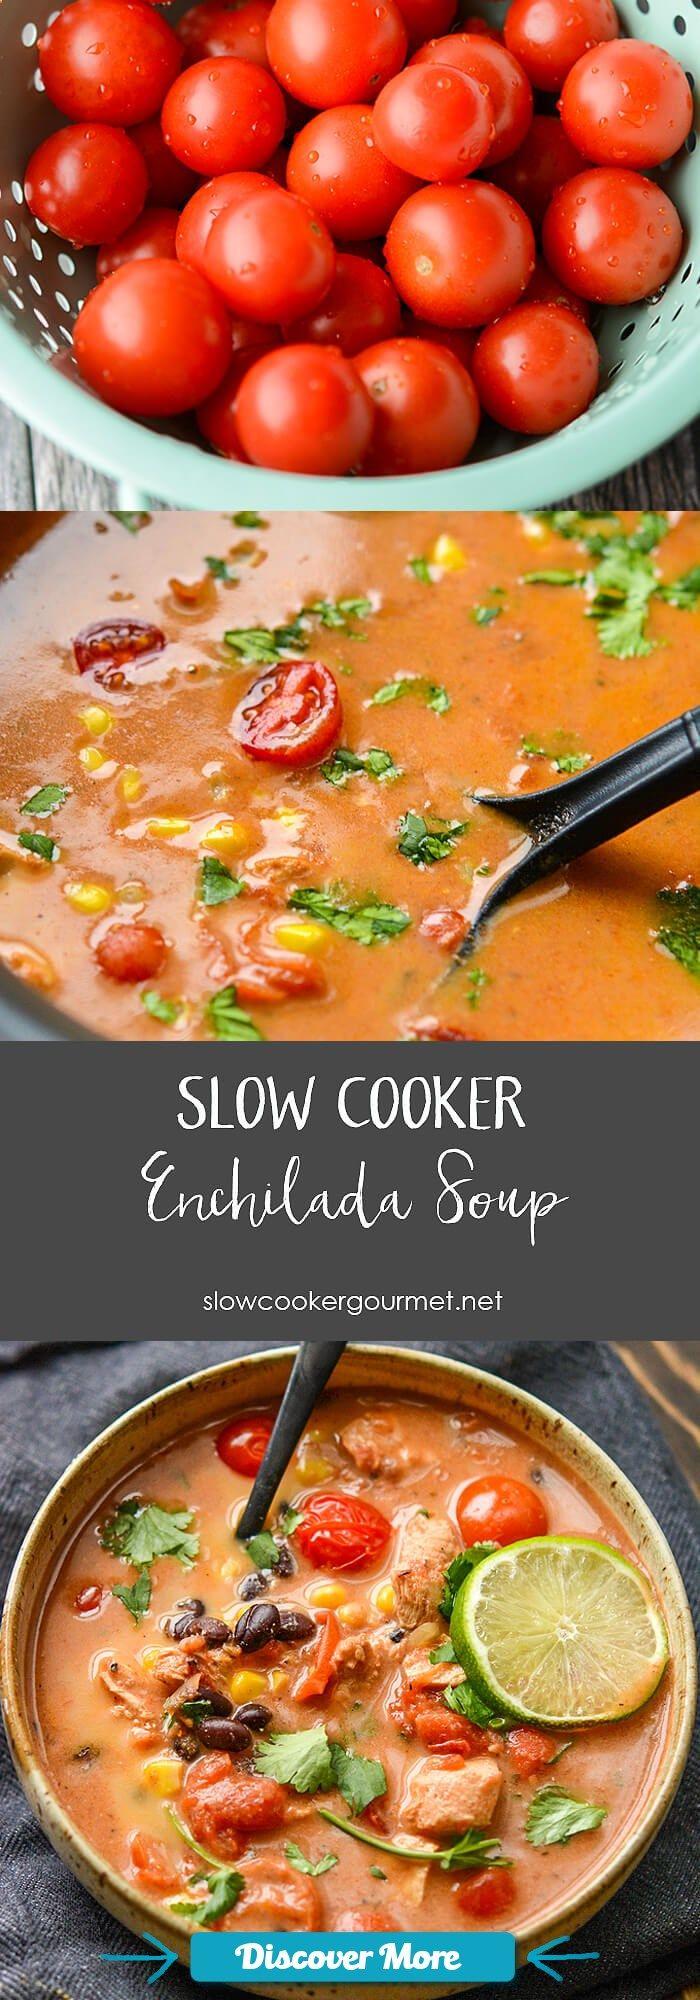 Slow Cooker Chicken Enchilada Soup #slowcooker #slowcook #slowcookerrecipes #slowcookerchicken